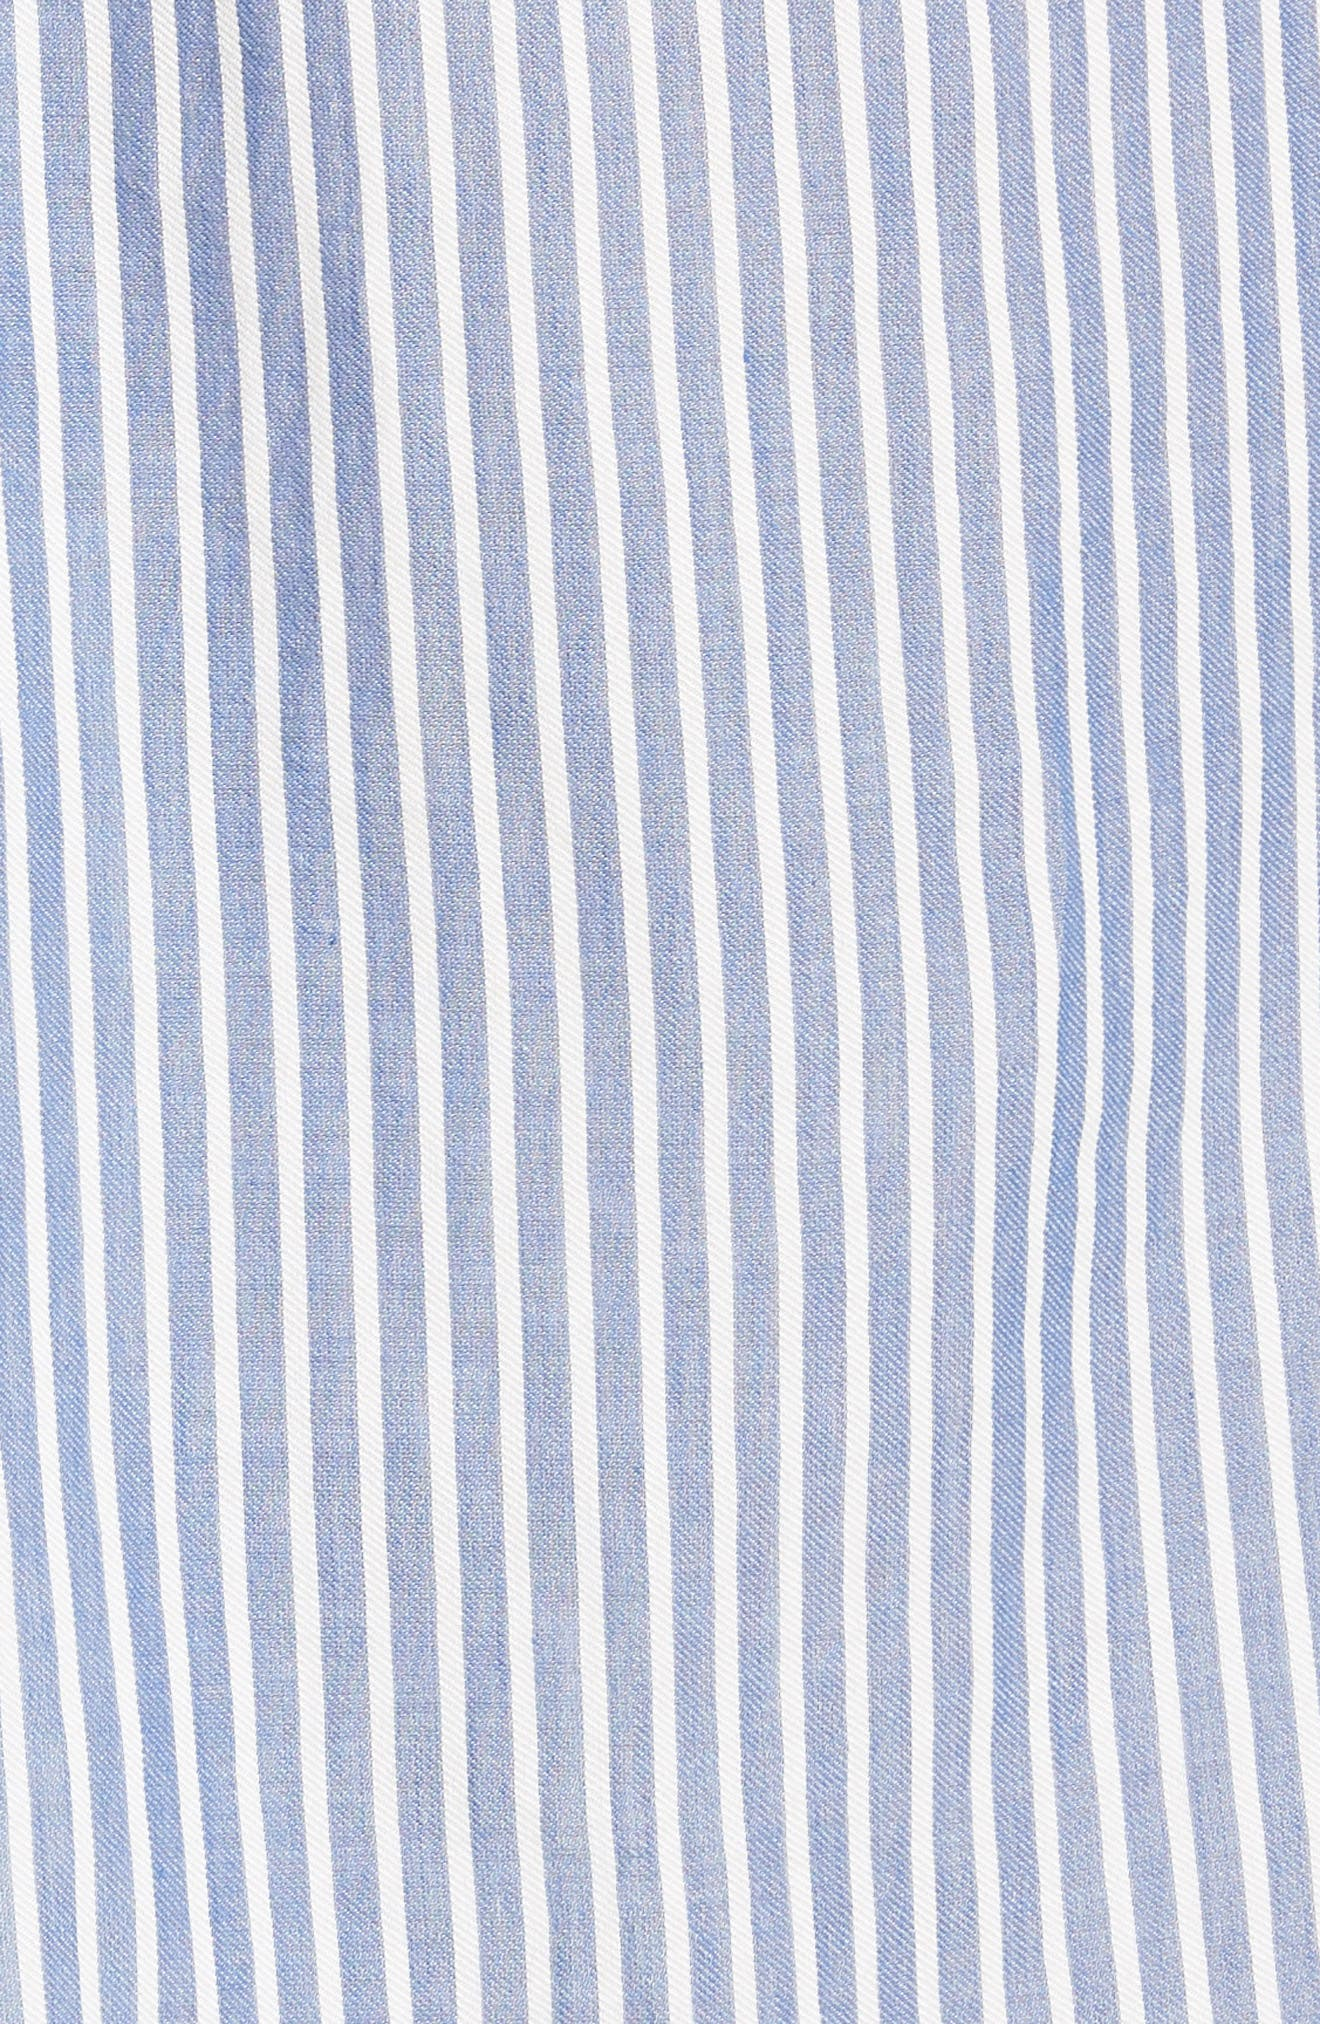 Classic Stripe Twist Cotton Blend Shirtdress,                             Alternate thumbnail 6, color,                             460